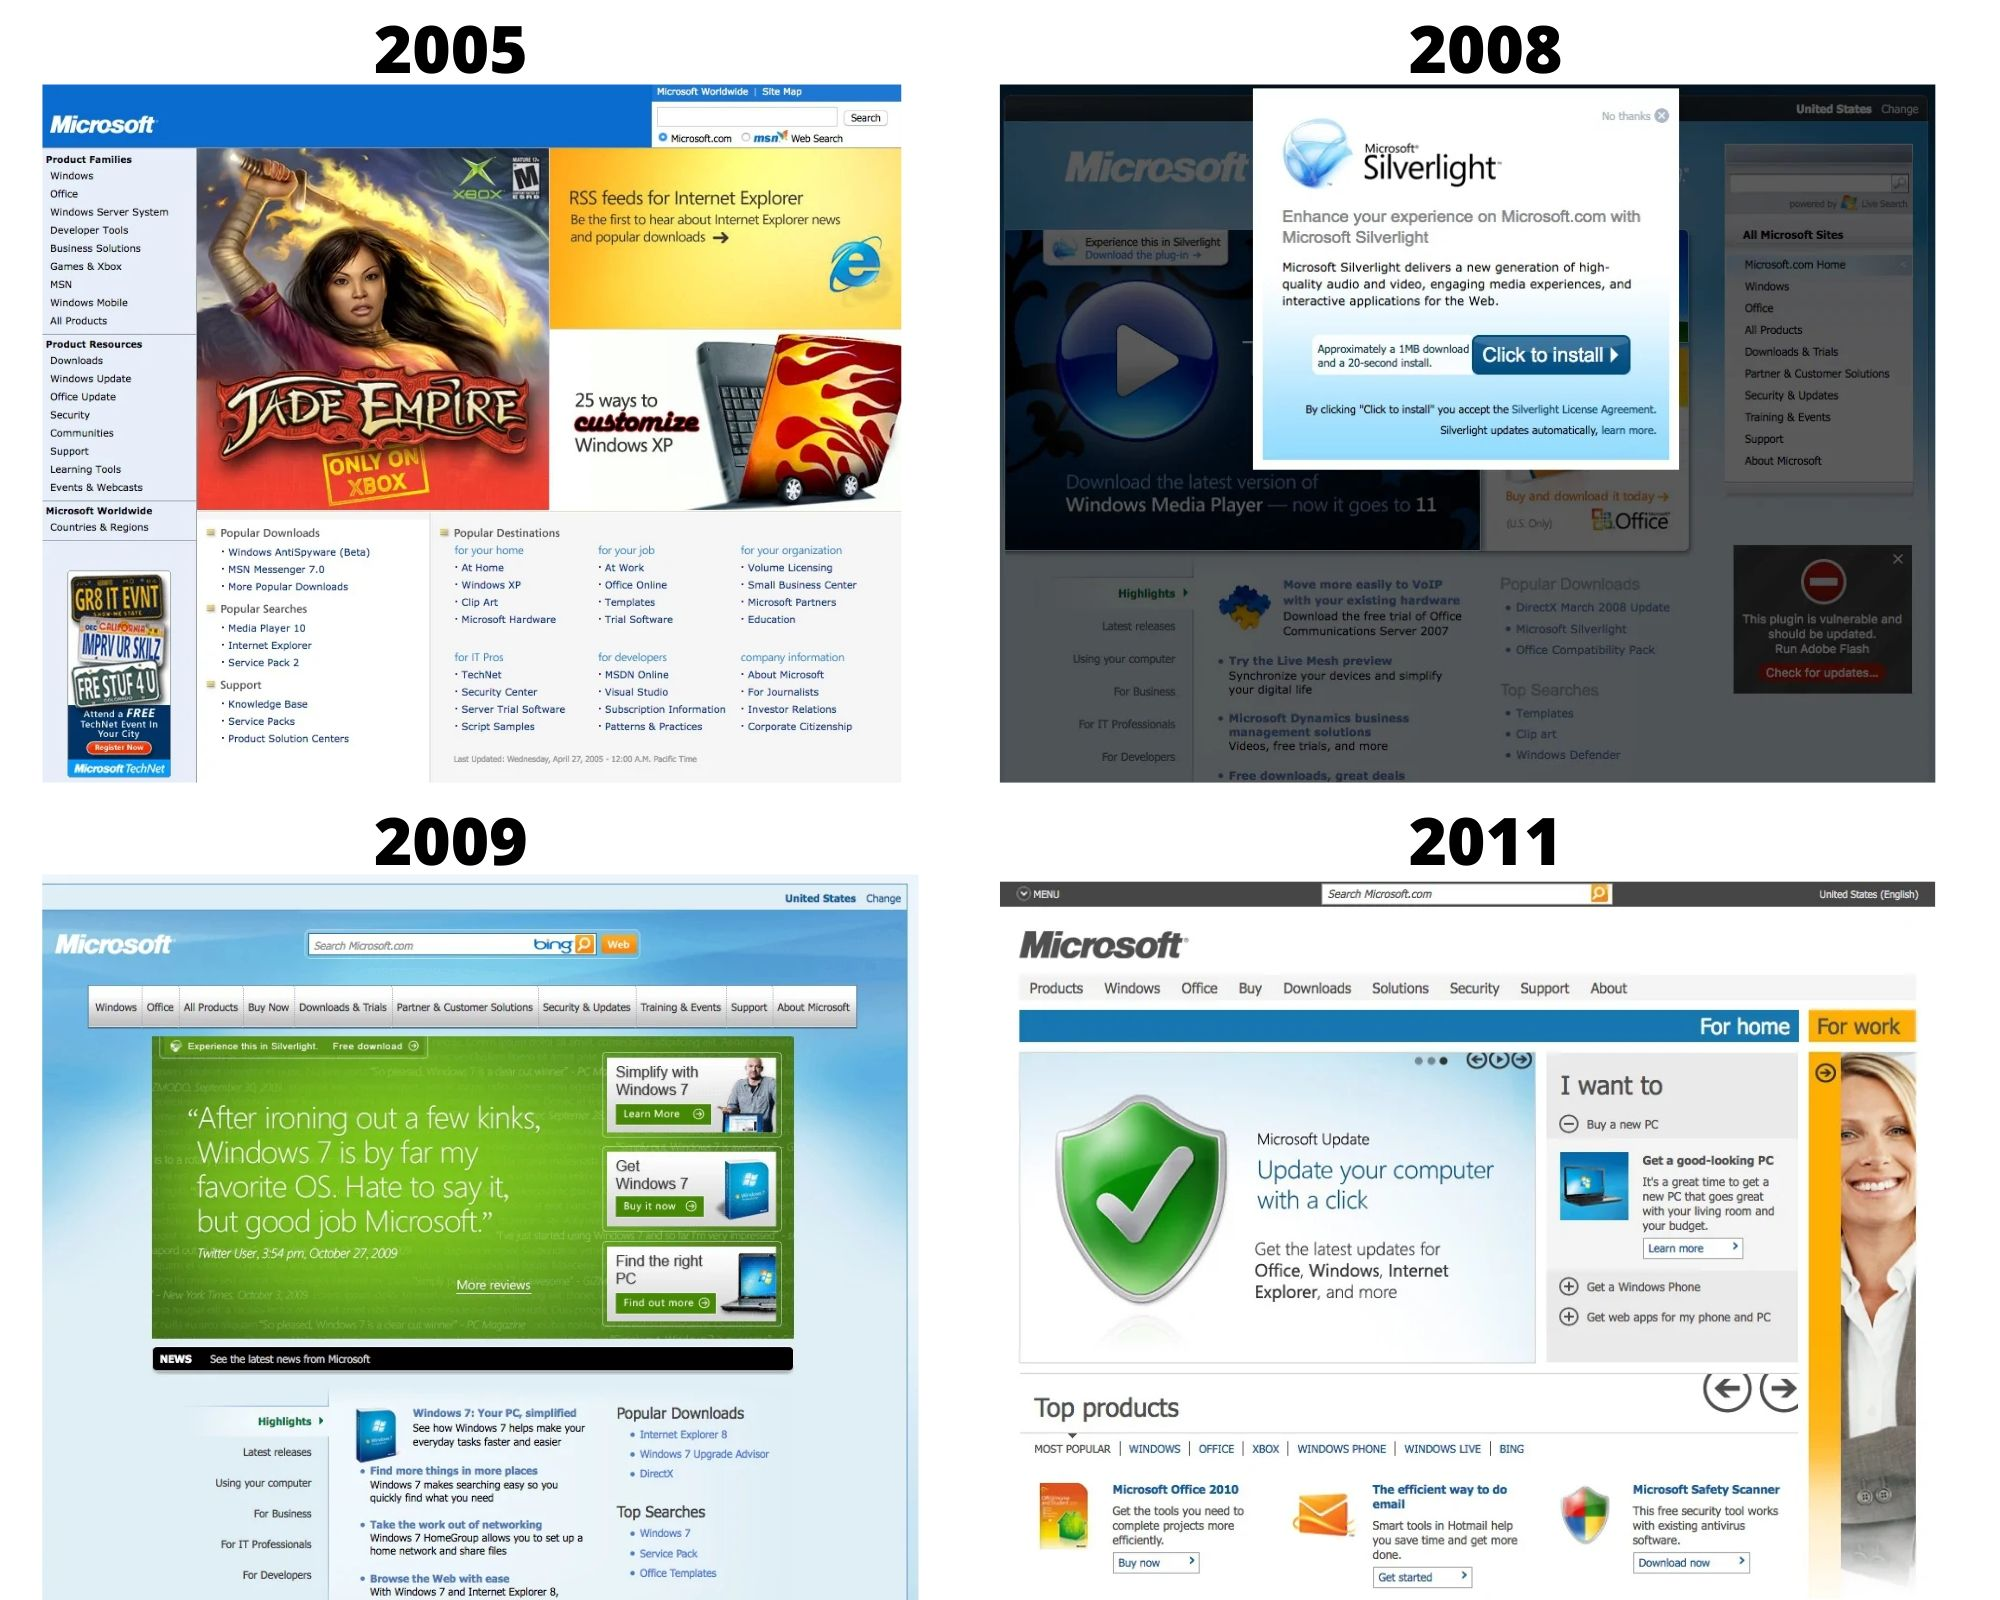 Microsoft design 2005 to 2011